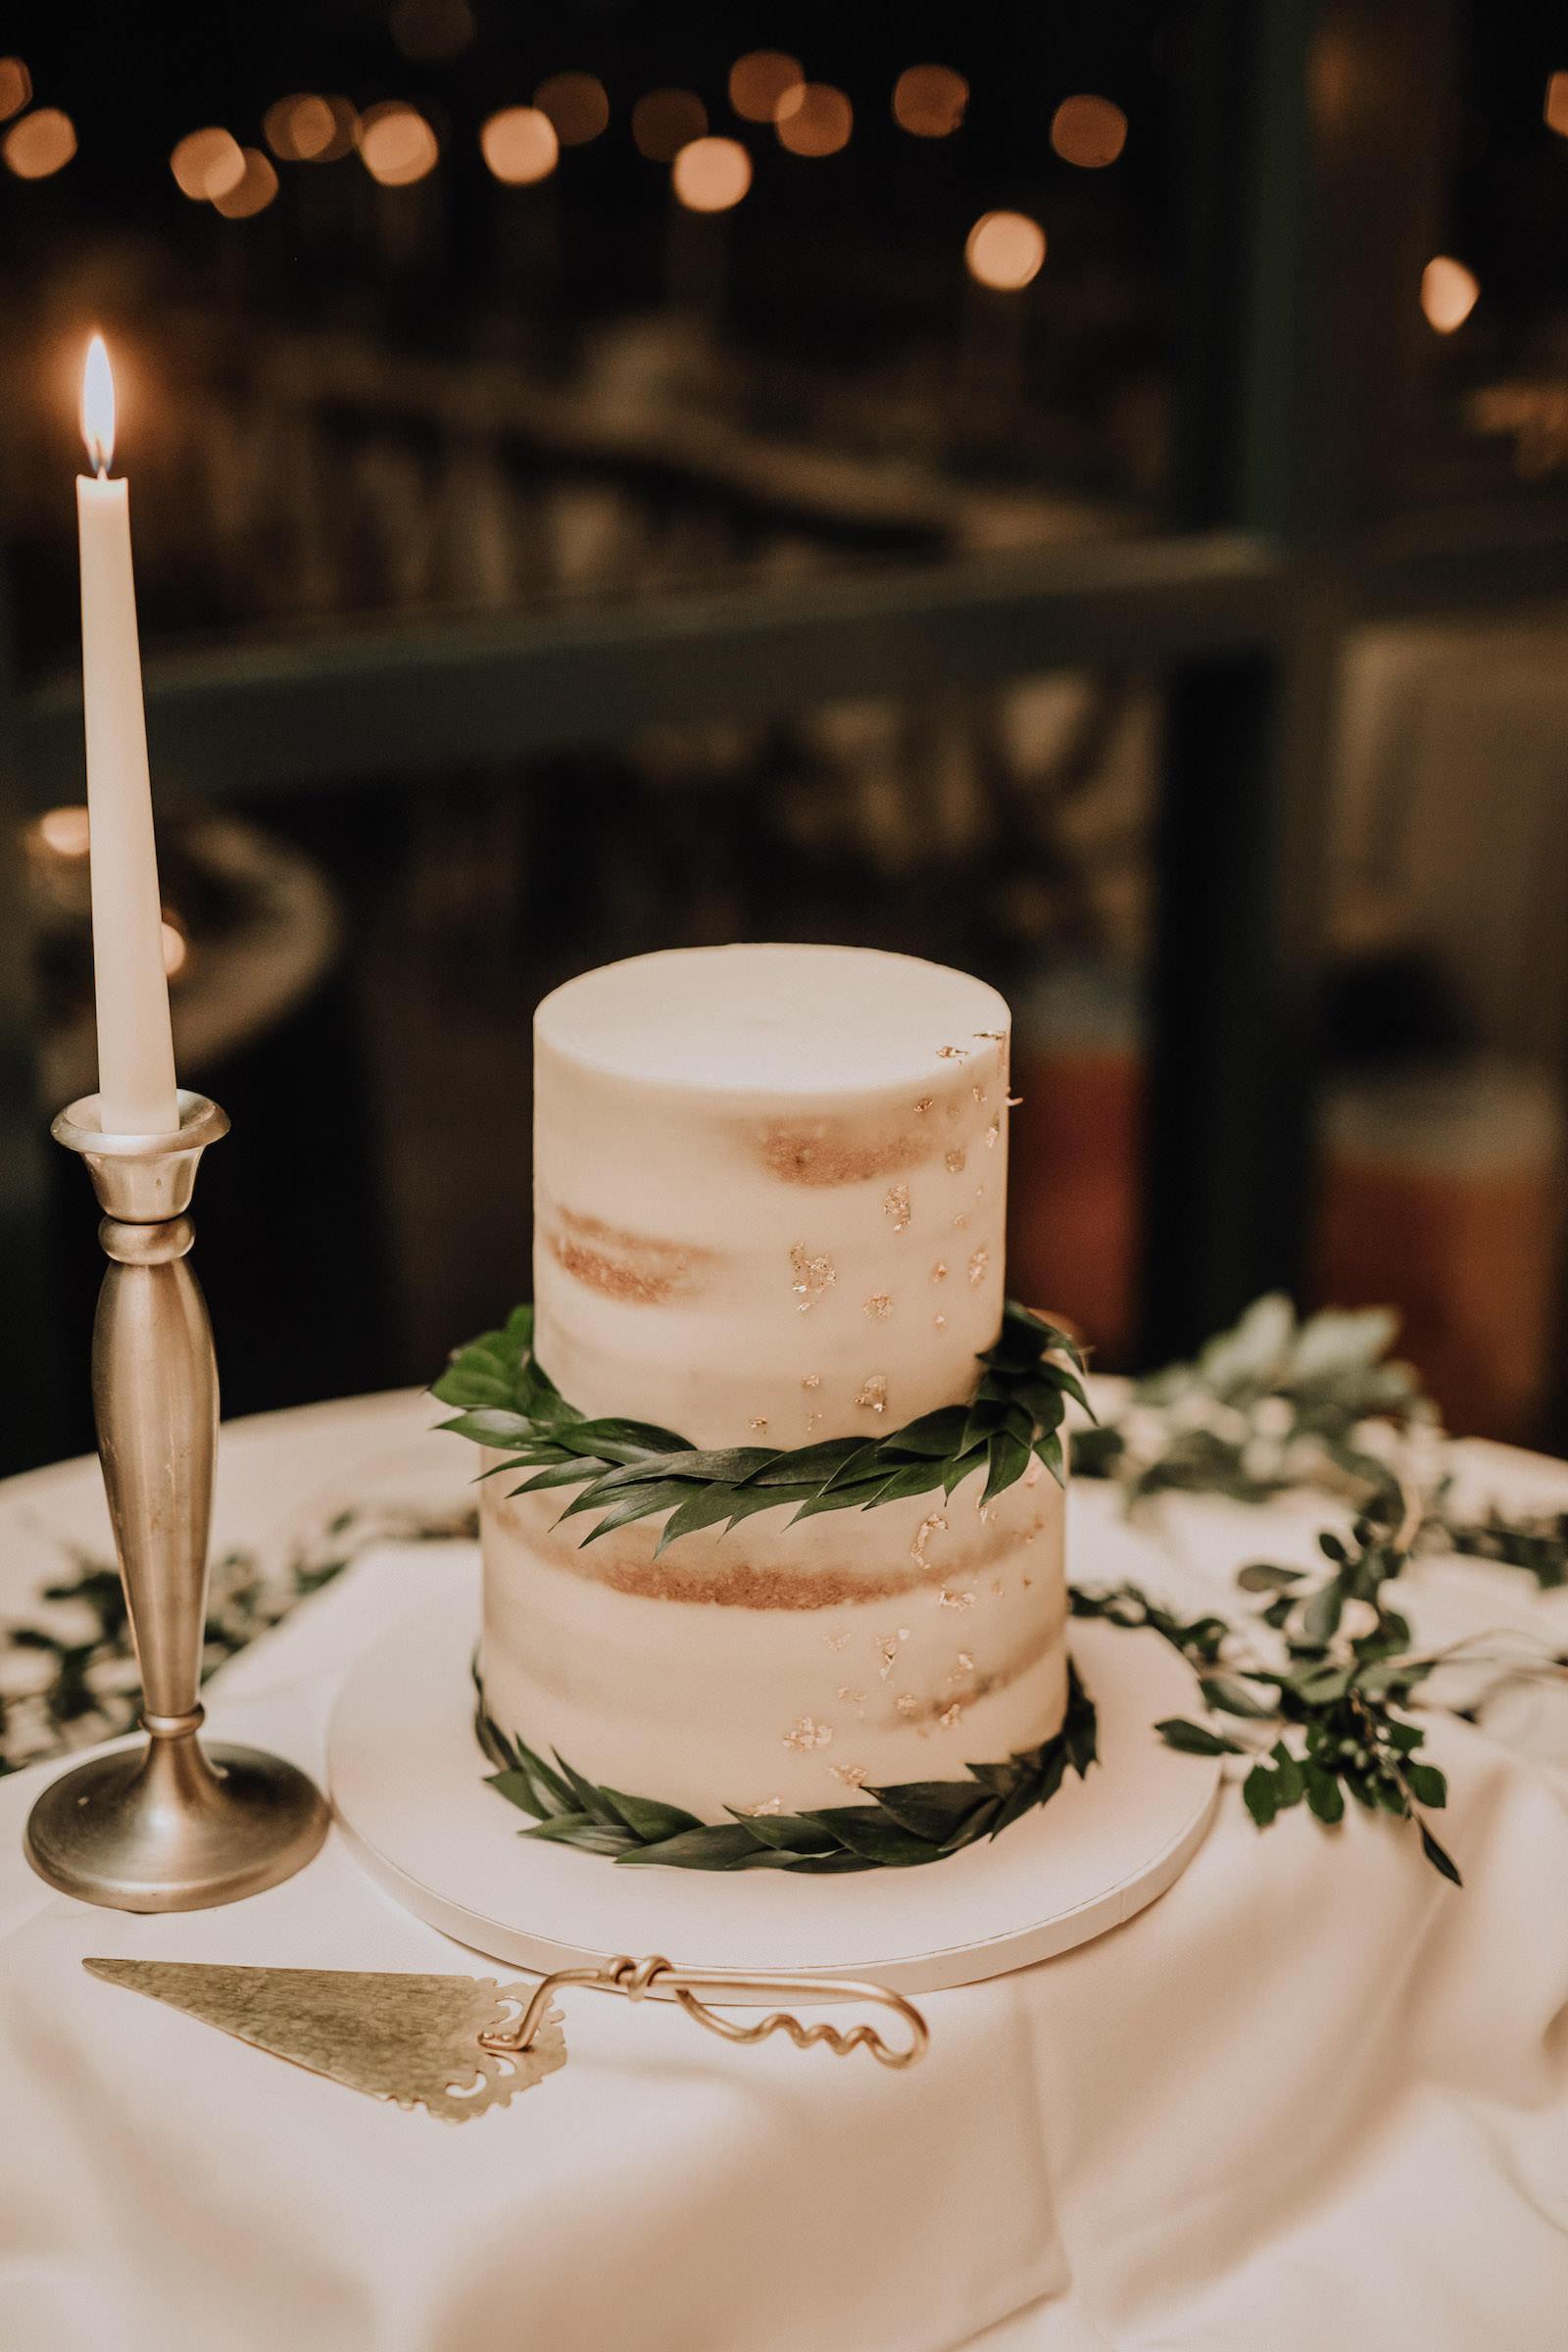 Mini Two-Tier Semi Naked Rustic Wedding Cake with Garland Greenery | Rustic Boho Wedding Cake Inspiration